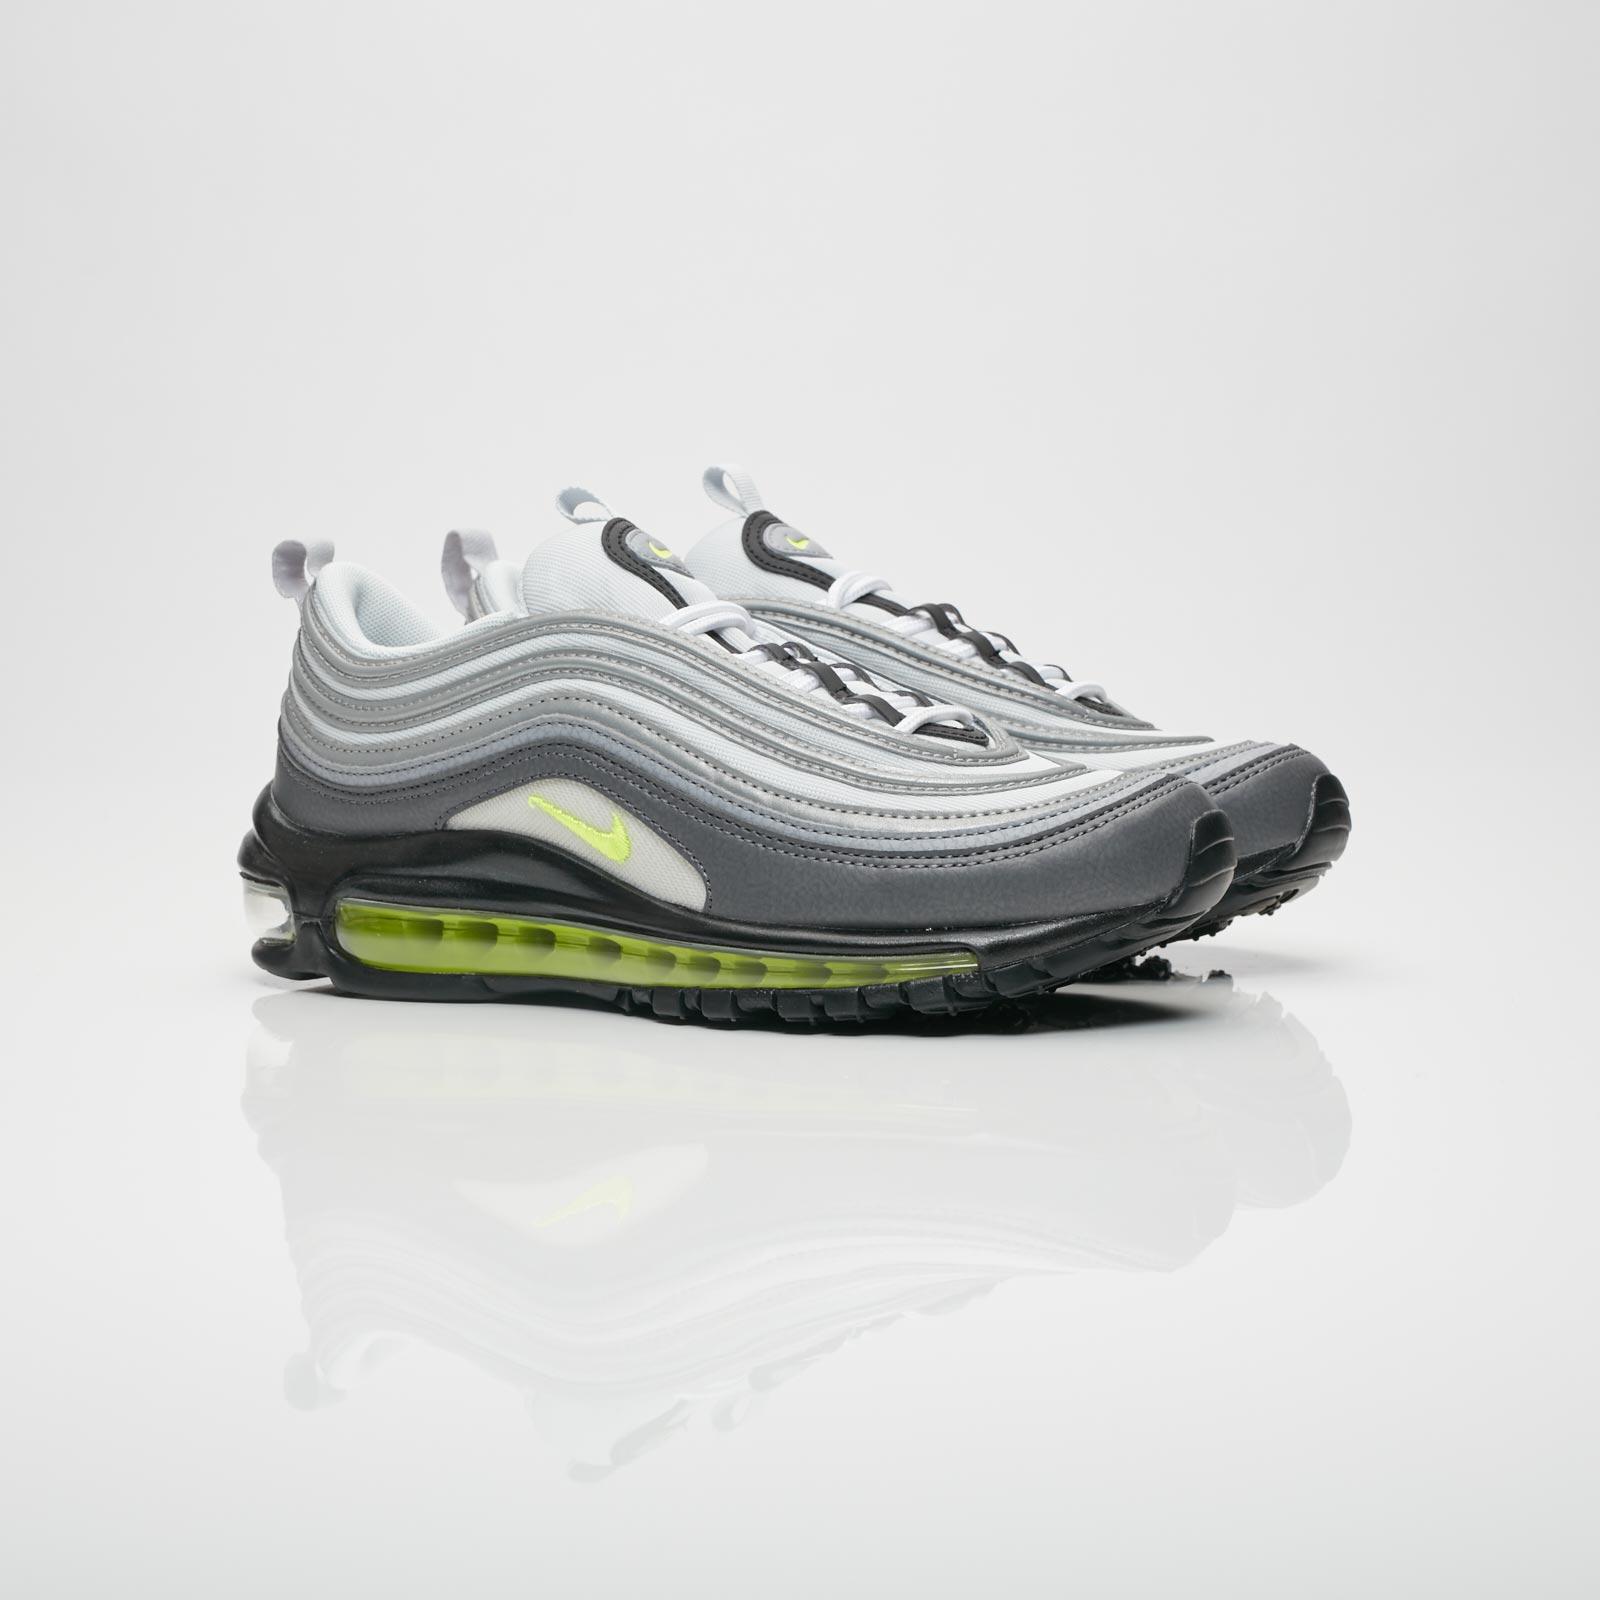 d7d9473839 Nike Wmns Air Max 97 - 921733-003 - Sneakersnstuff | sneakers ...